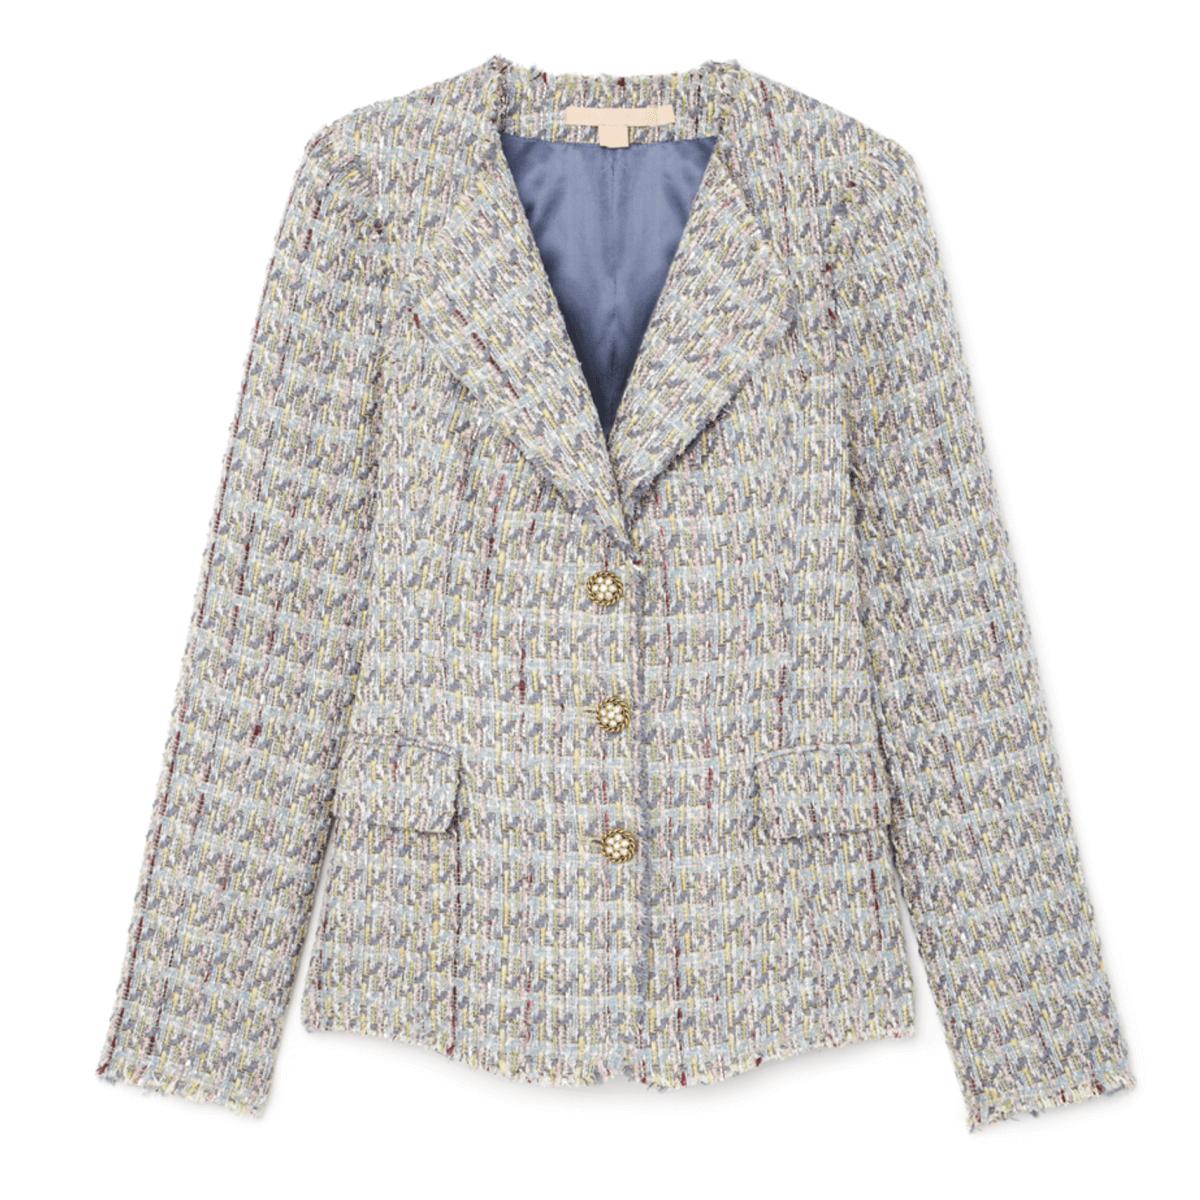 Brock Collection Portman Tweed Jacket